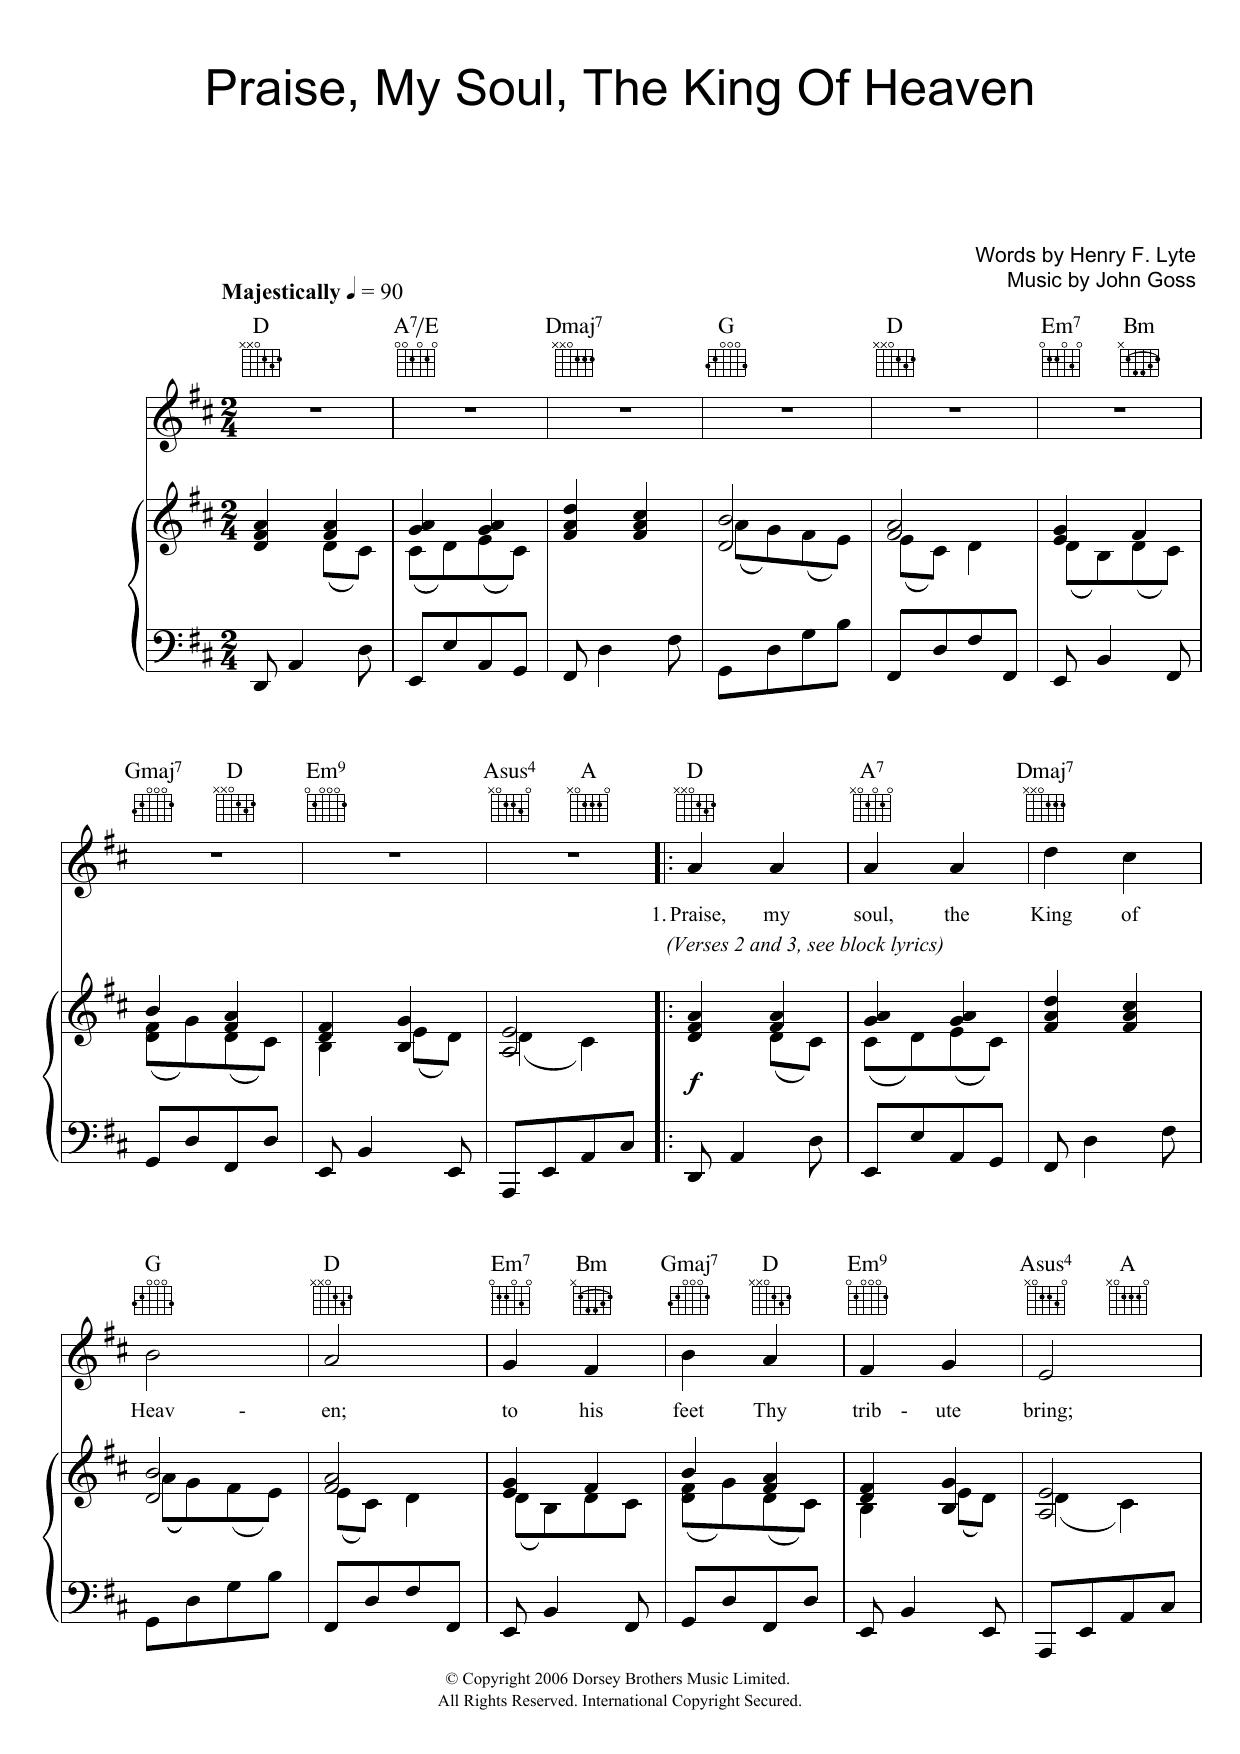 Praise, My Soul, The King Of Heaven sheet music